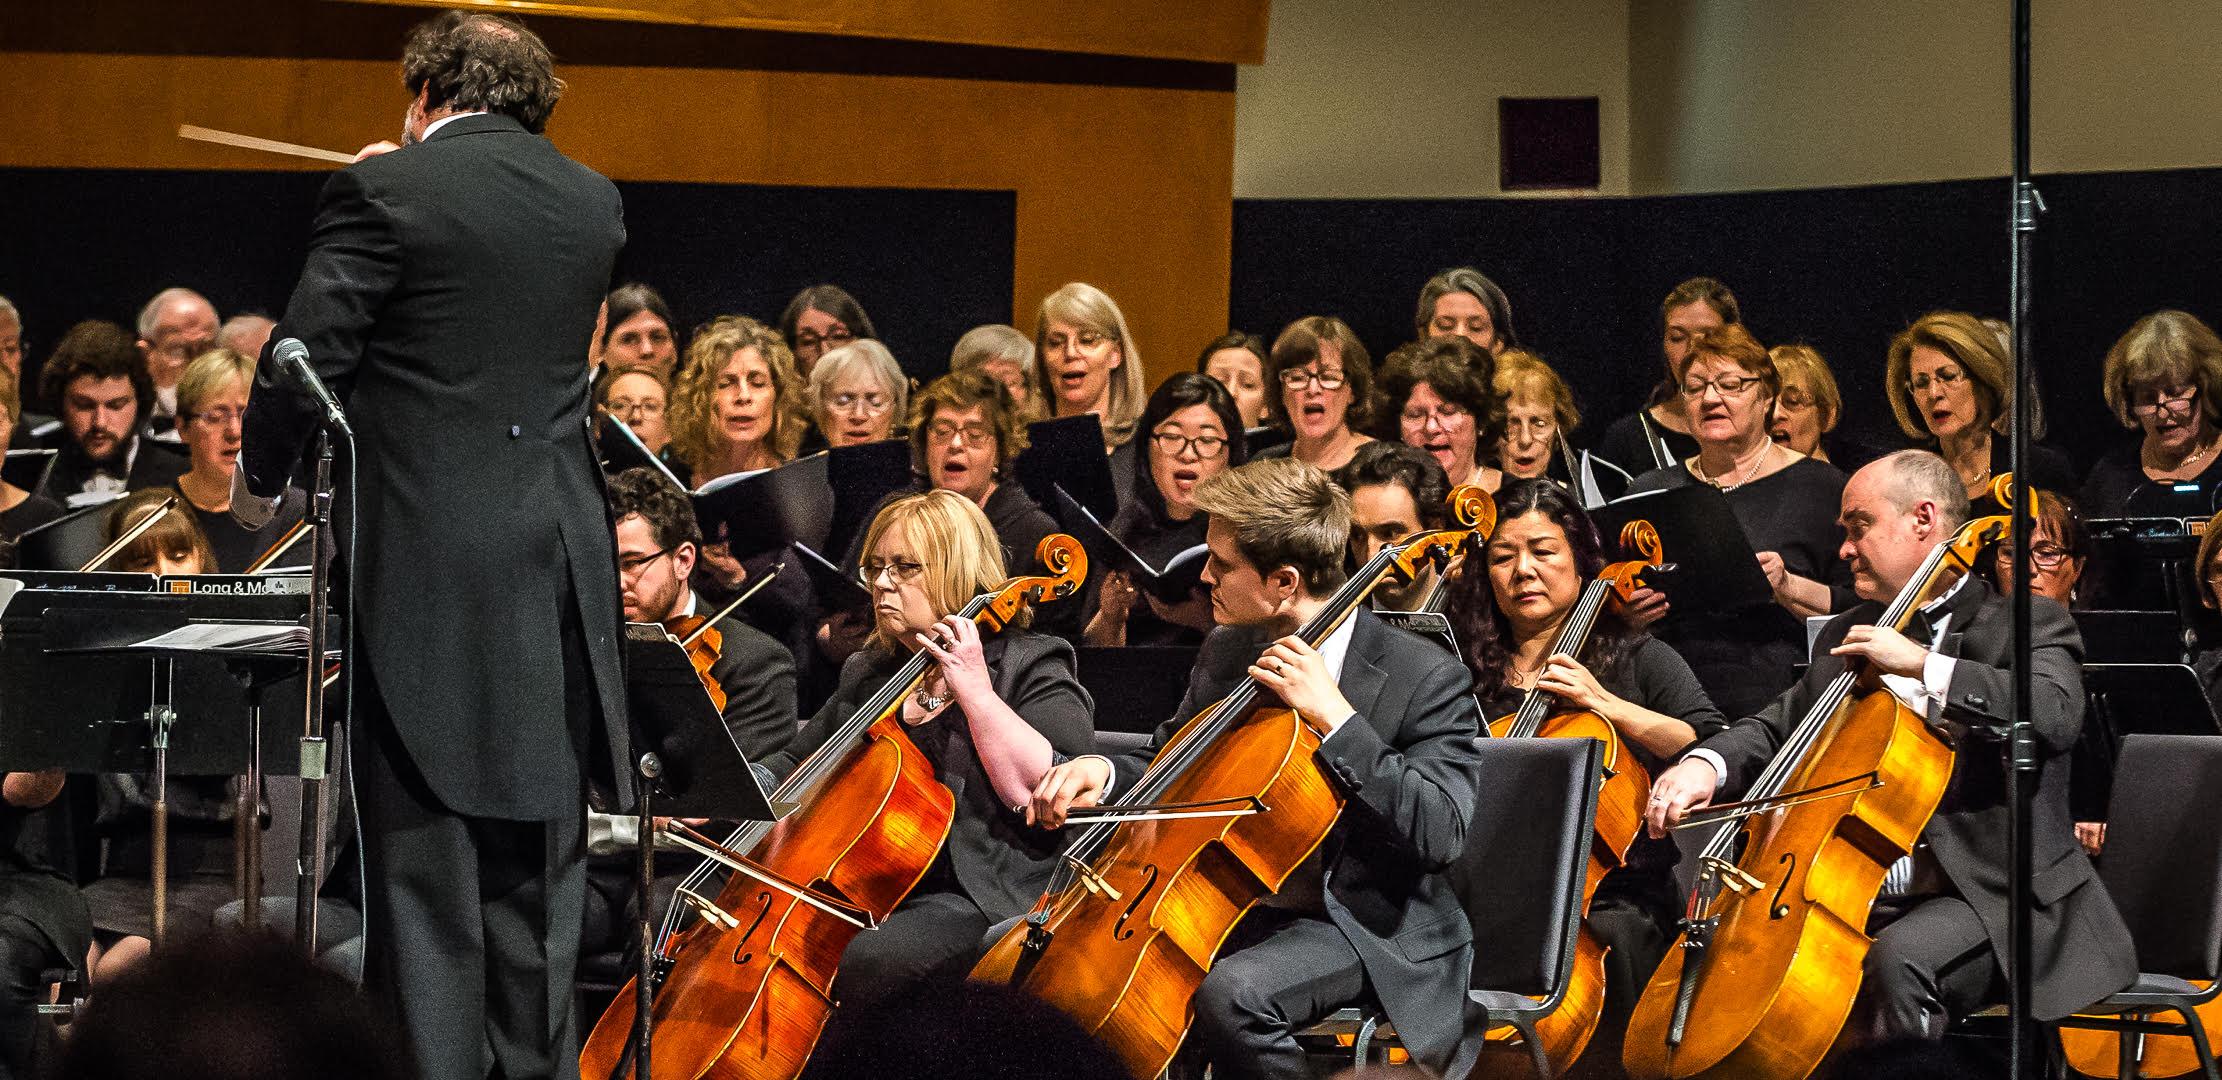 The toronto choral society and the scarborough philharmonic orchestra performing antonio vivaldi's gloria, at the scarborough citadel. April 7, 2018.